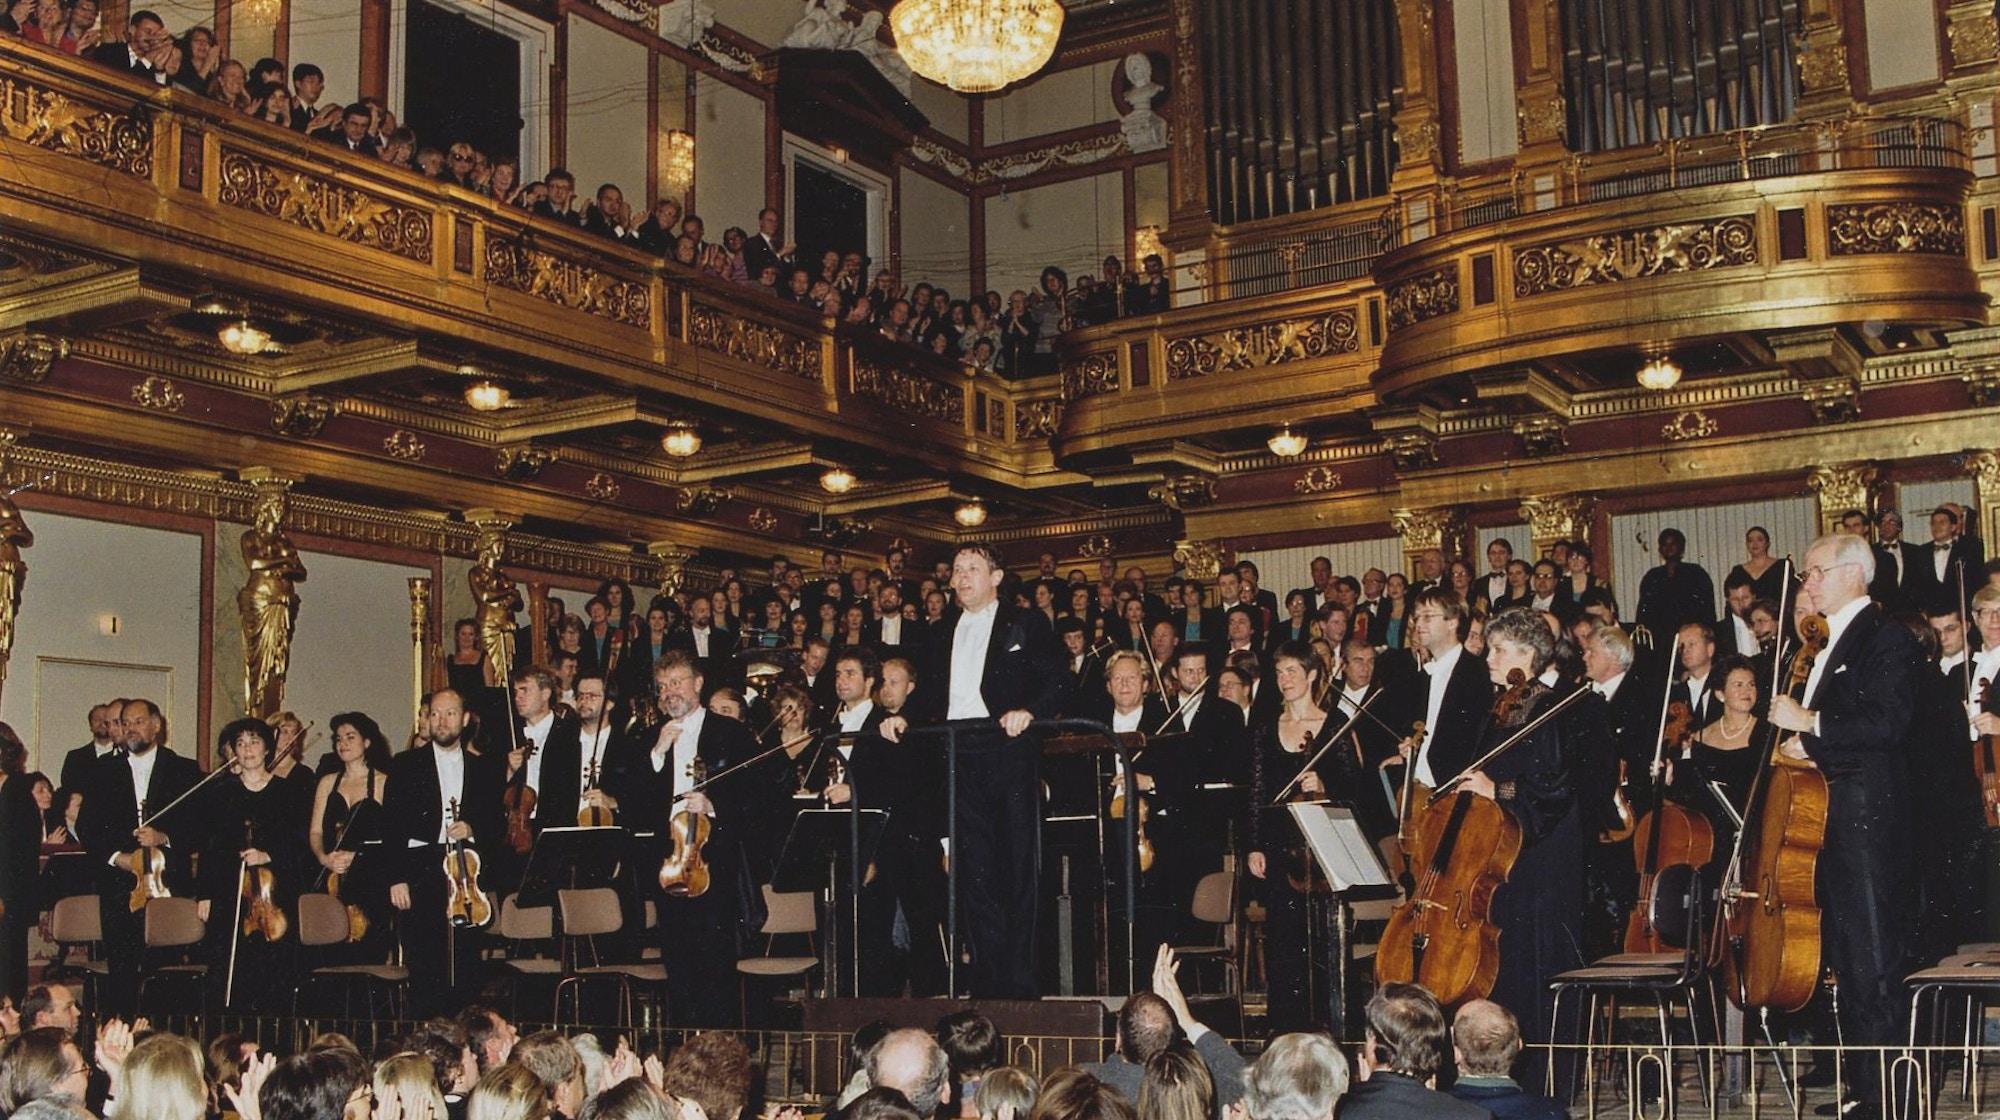 Oslo-Filharmonien og Mariss Jansons i Wiener Musikverein i 1997.